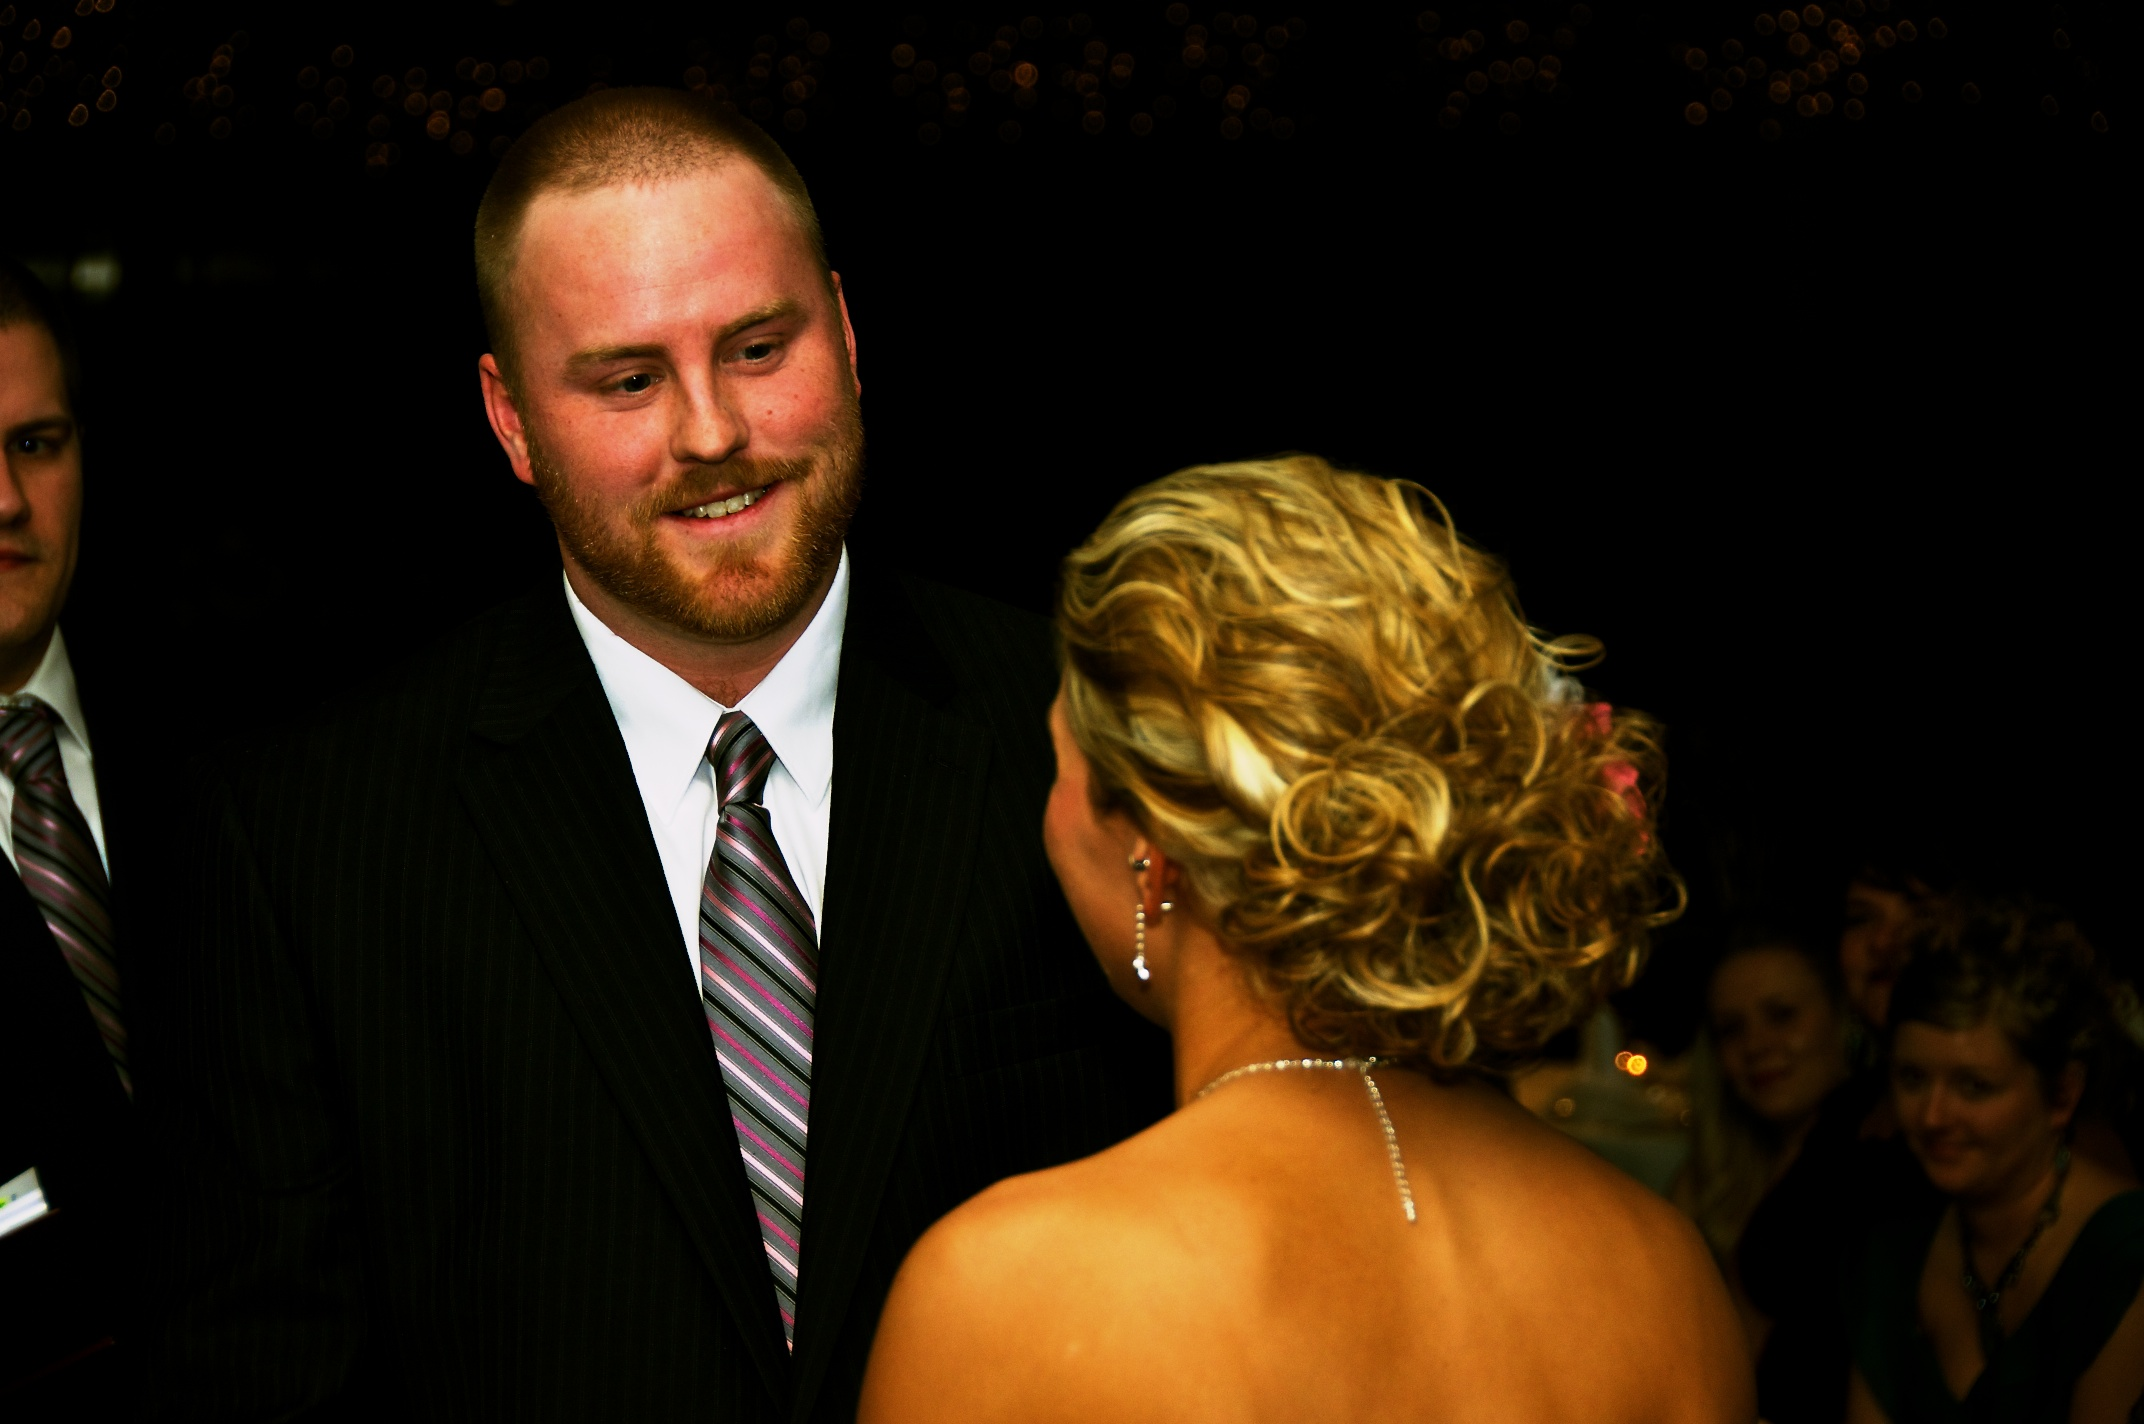 Dudeck+Wedding+%28finals-web%29+39-1930254434-O.jpg